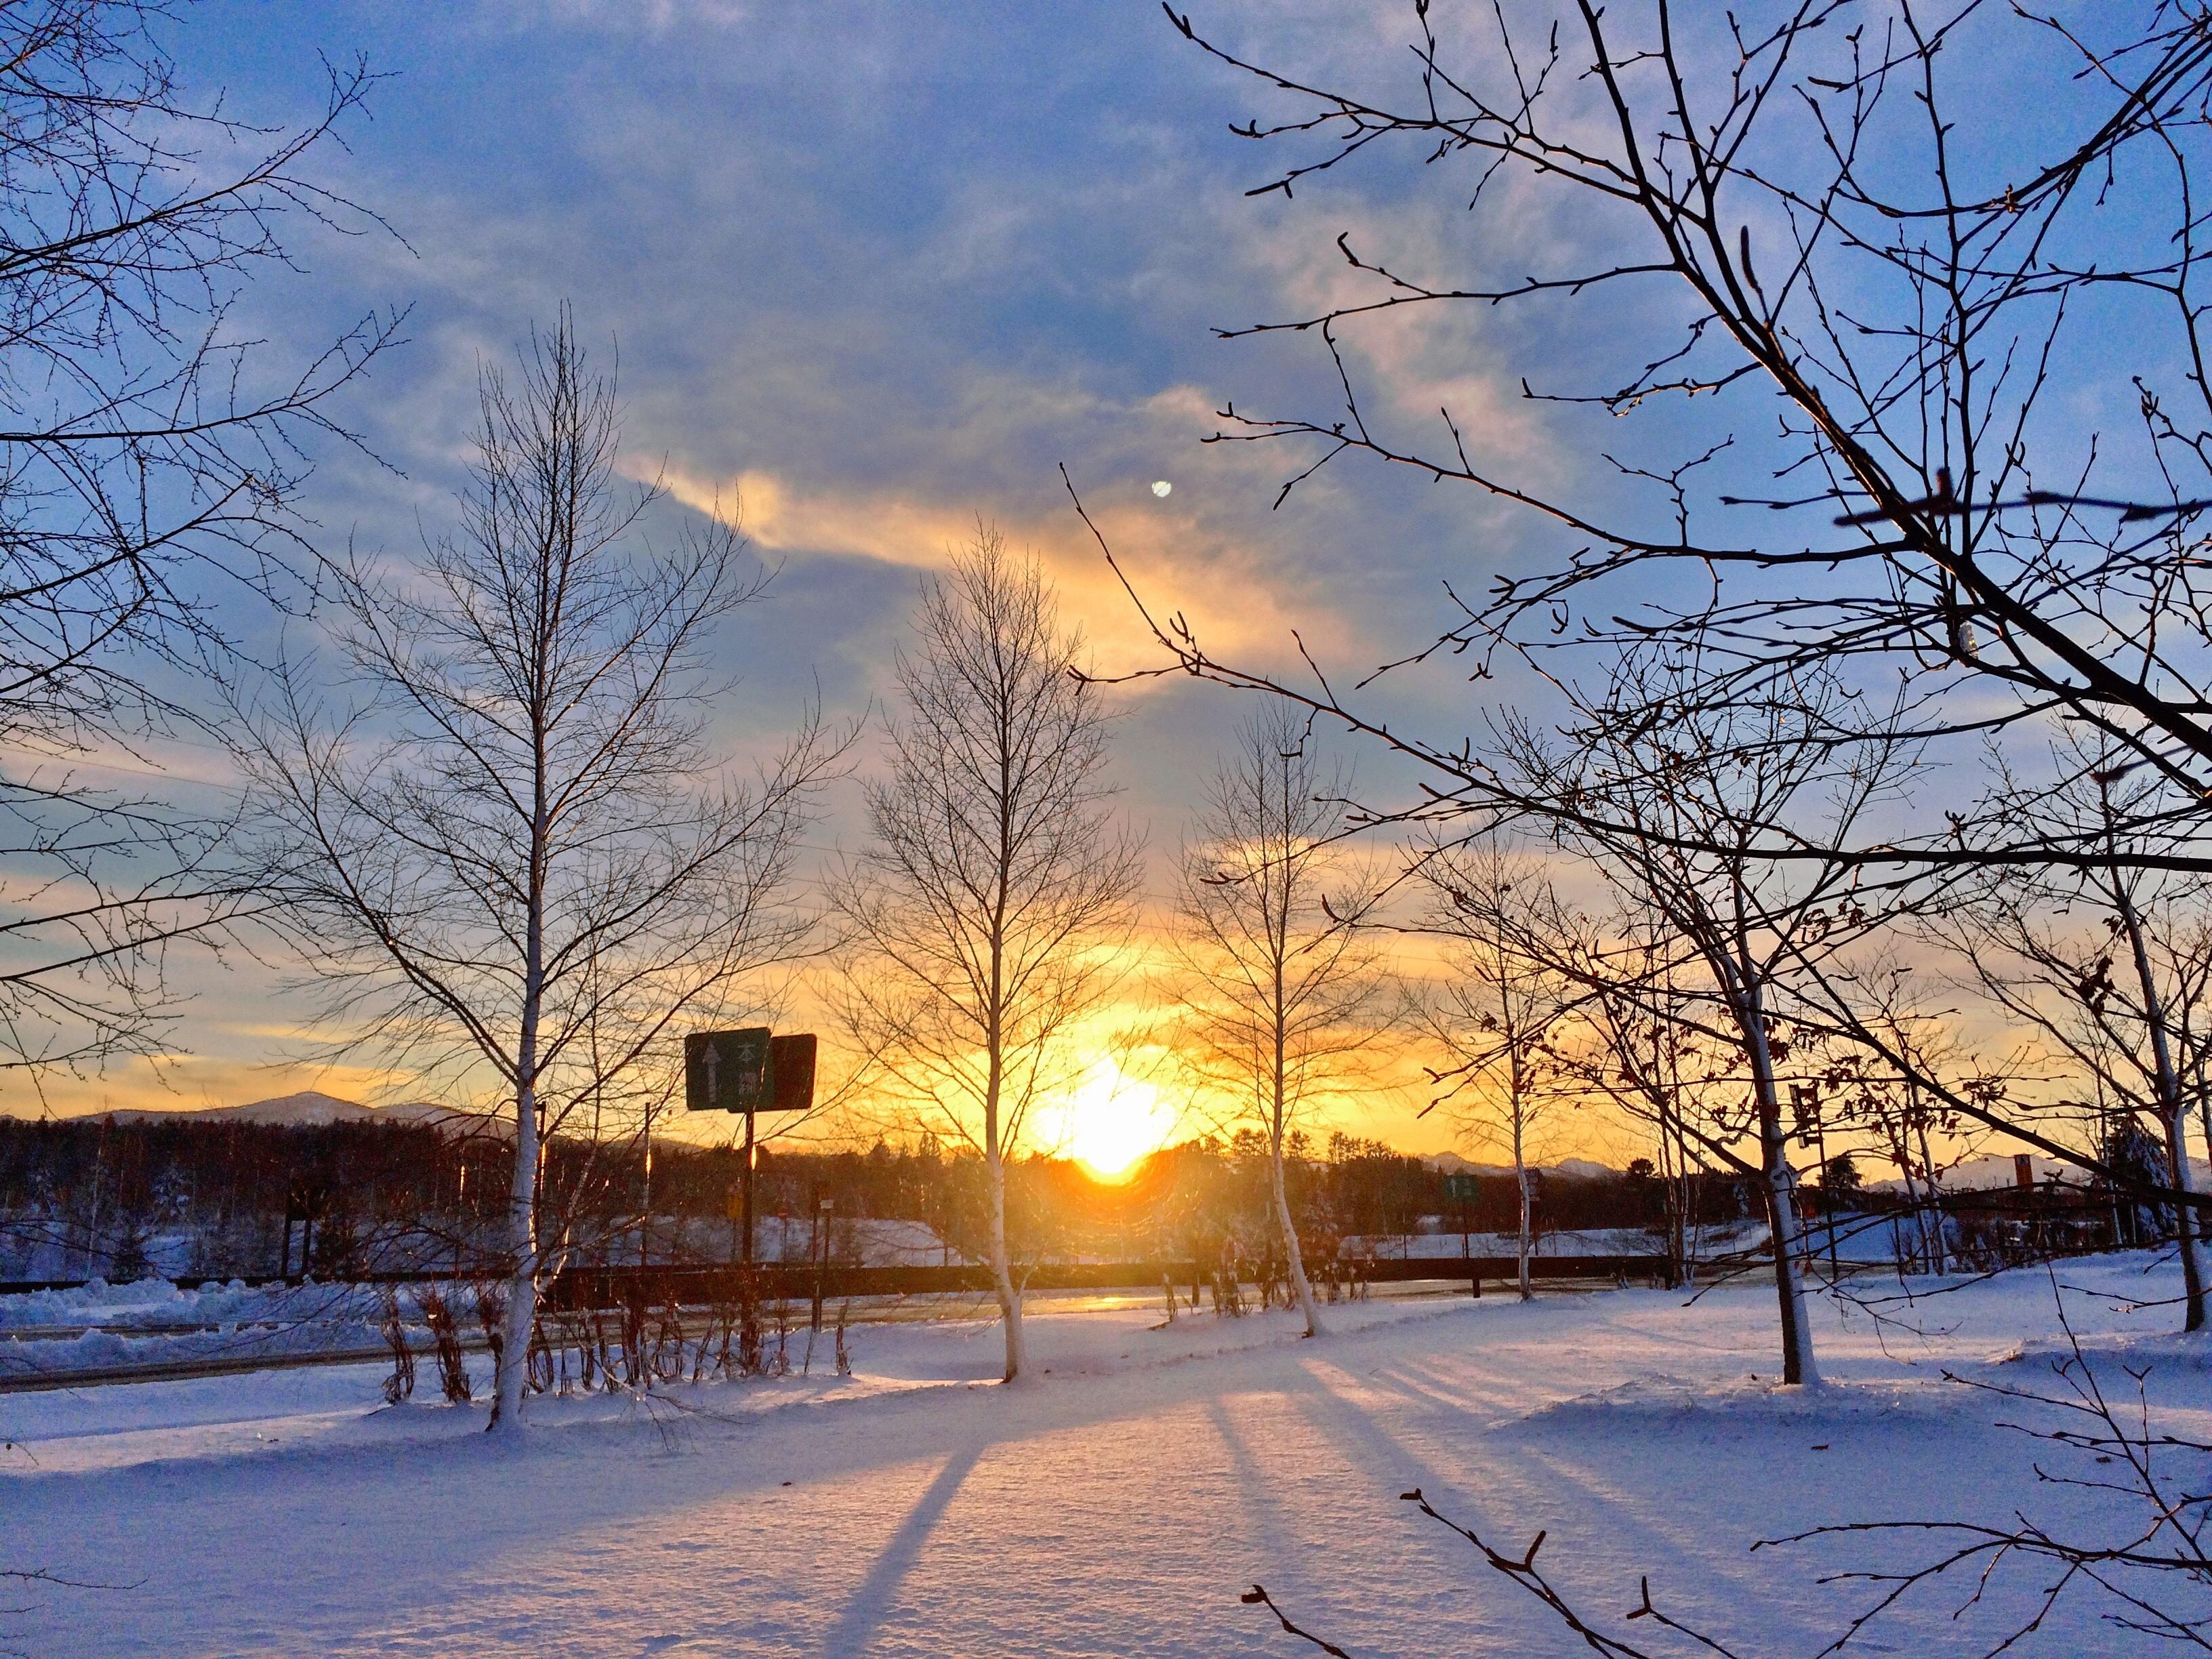 無料画像 風景 木 地平線 ブランチ 雪 冬 雲 空 日光